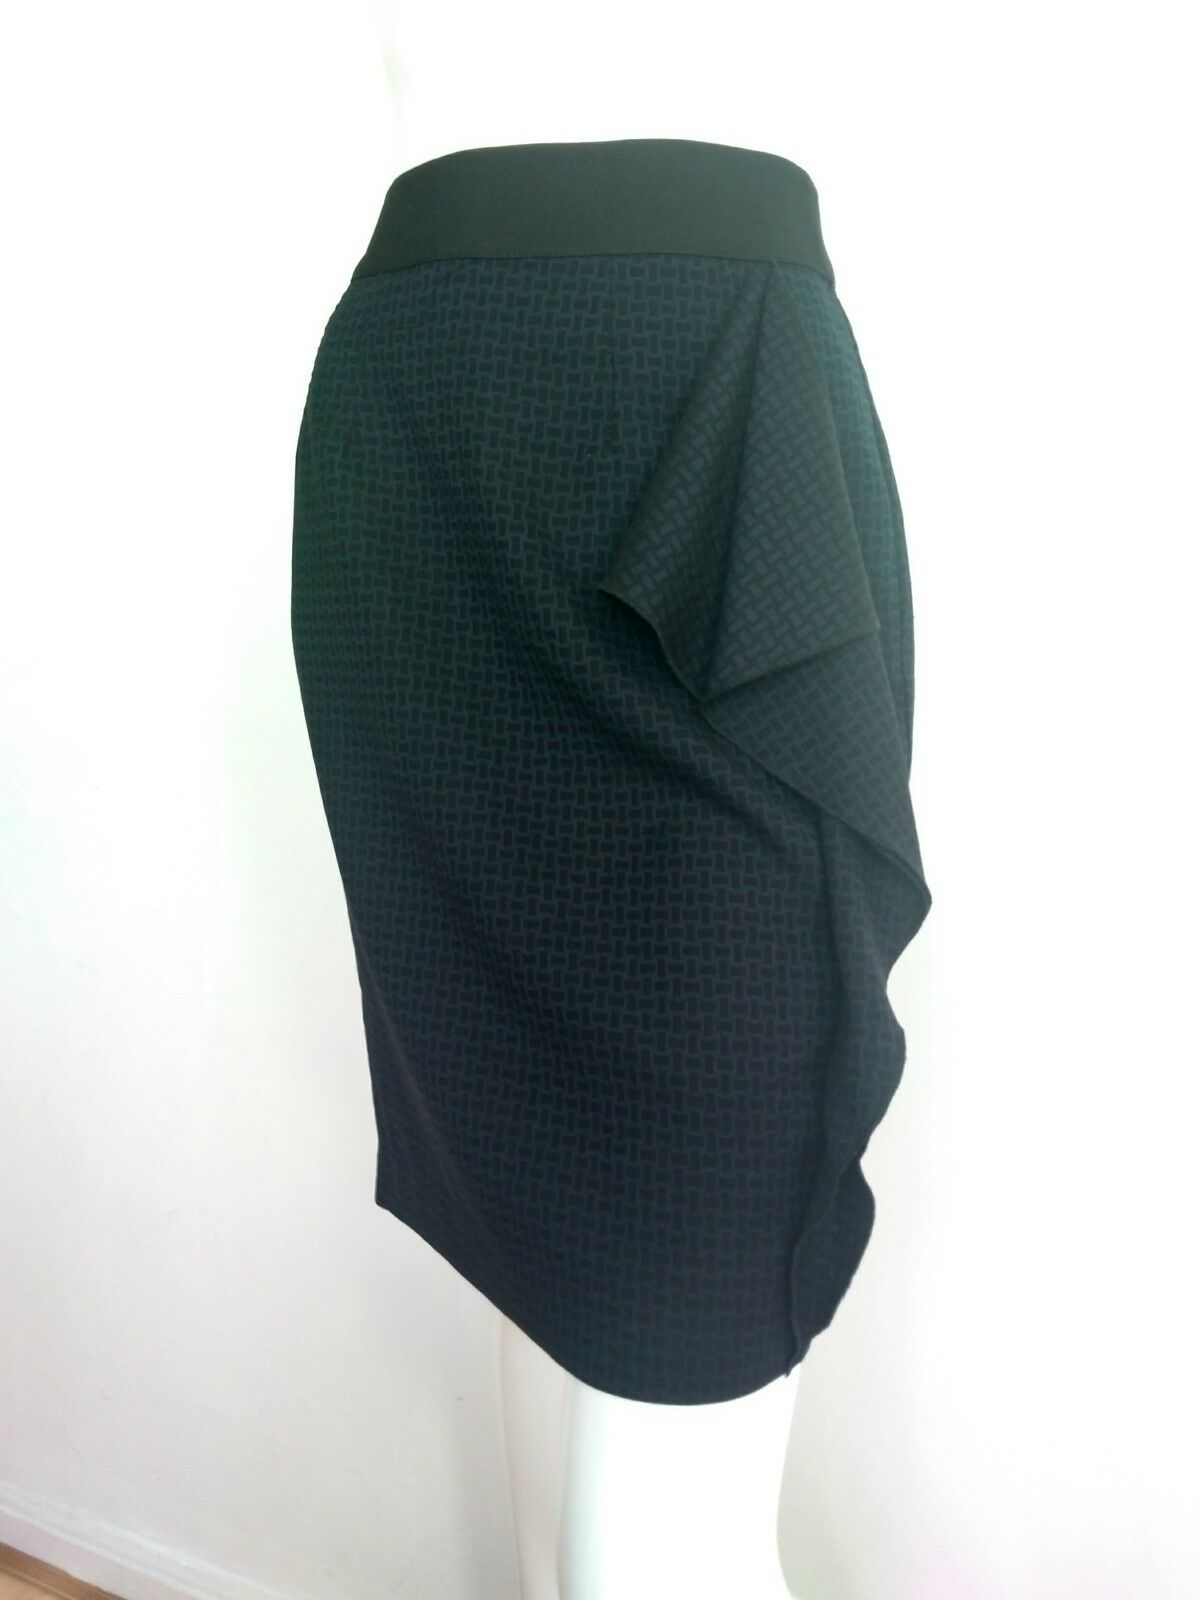 Designer ROKSANDA ILINCIC skirt size 12 -NEW WITH TAGS-knee length ruffle detail